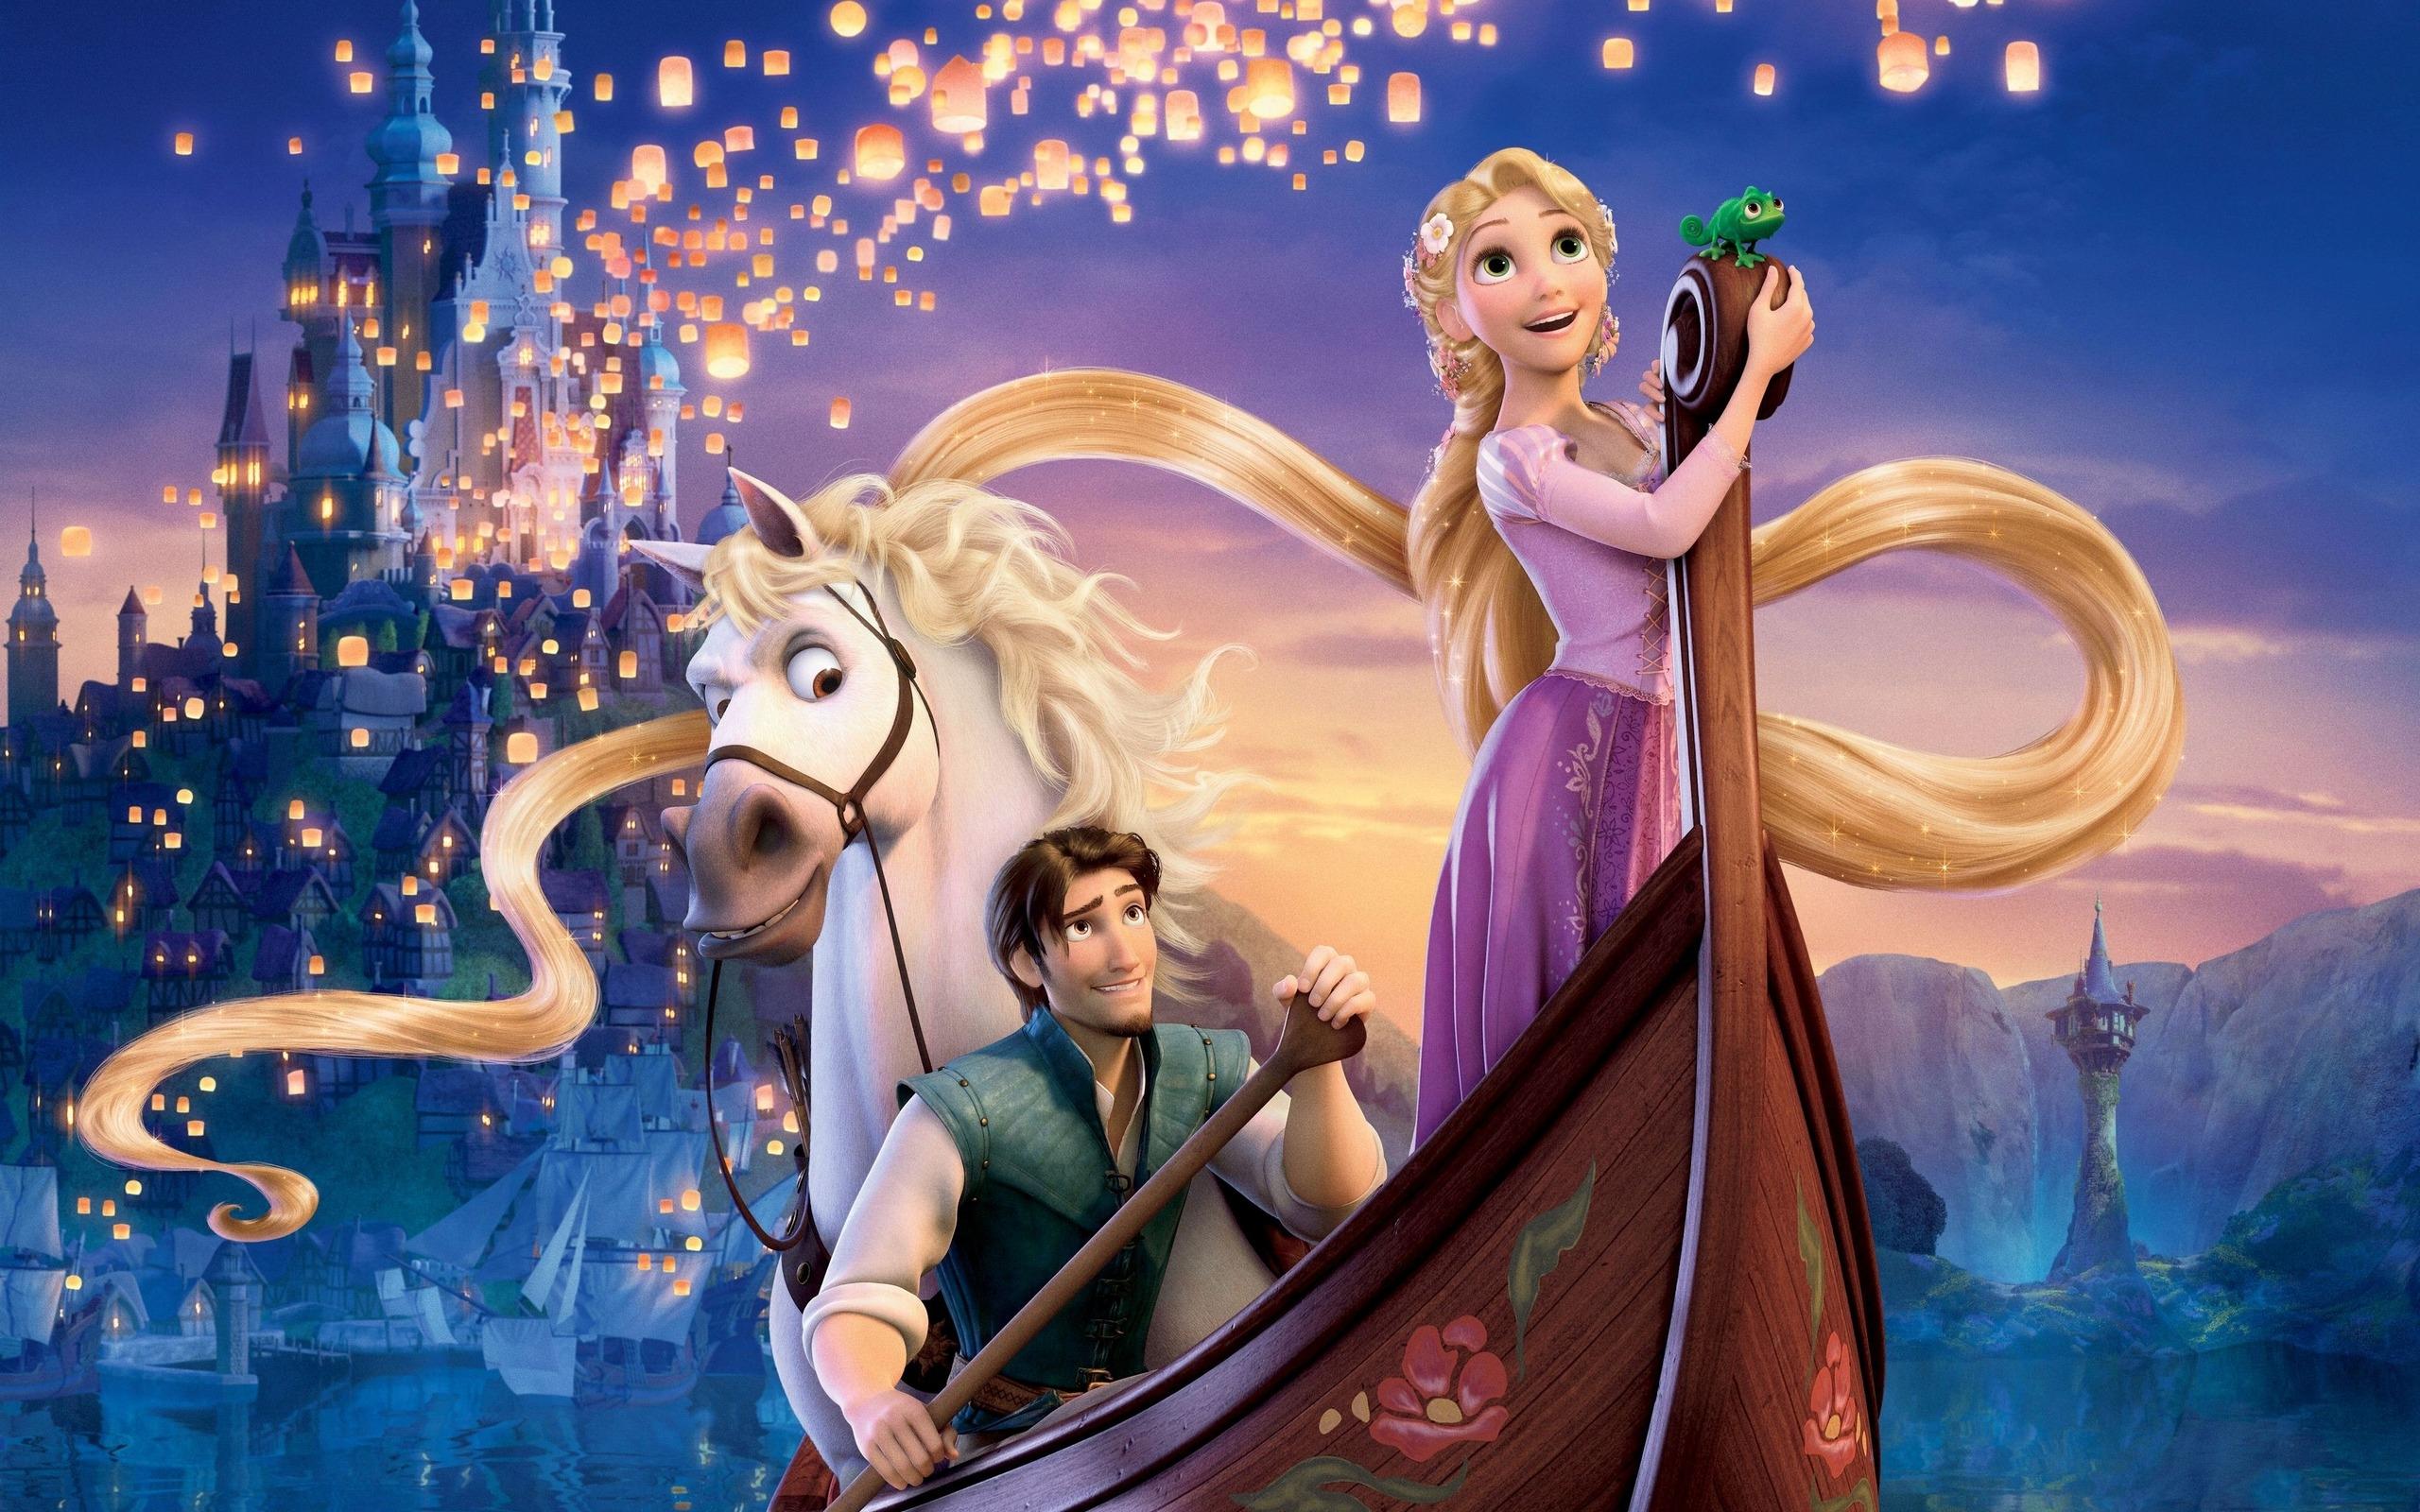 Disney Movies Hd Wallpapers: Disney Movie Wallpaper